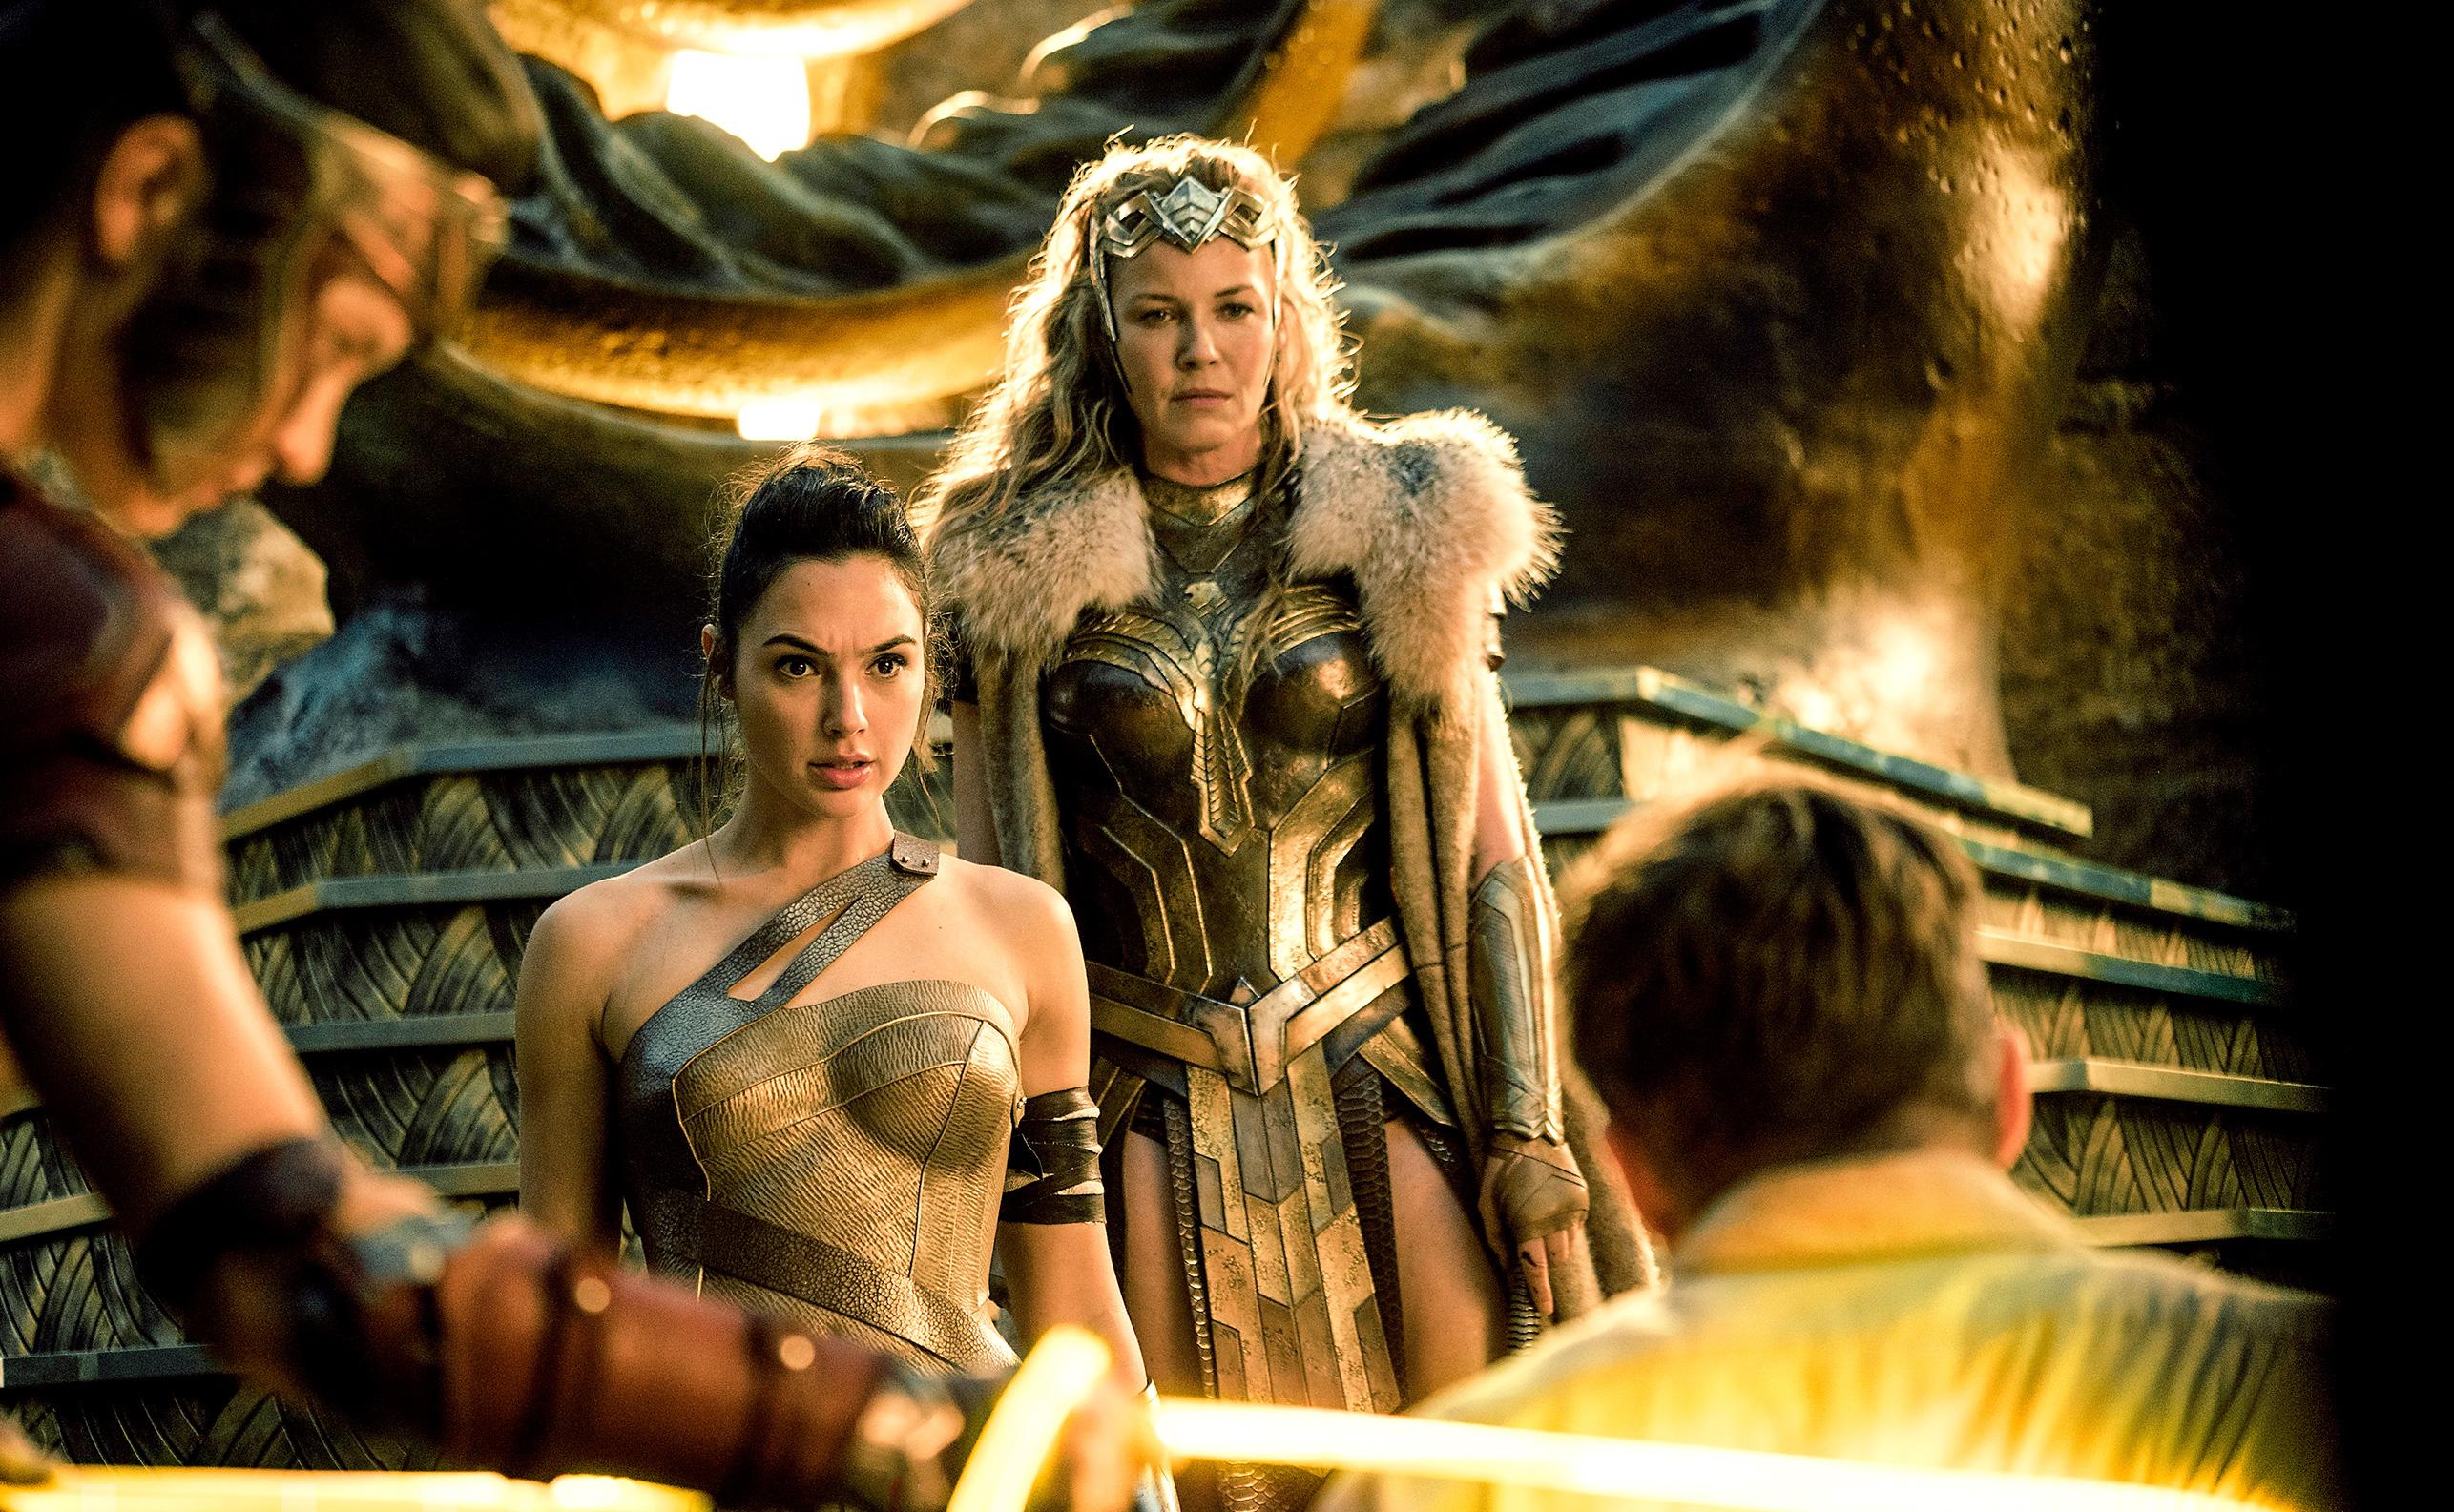 Wallpaper Gal Gadot Wonder Woman 2017 Movies Hd Movies: Wonder Woman Gal Gadot Connie Nielsen, HD Movies, 4k